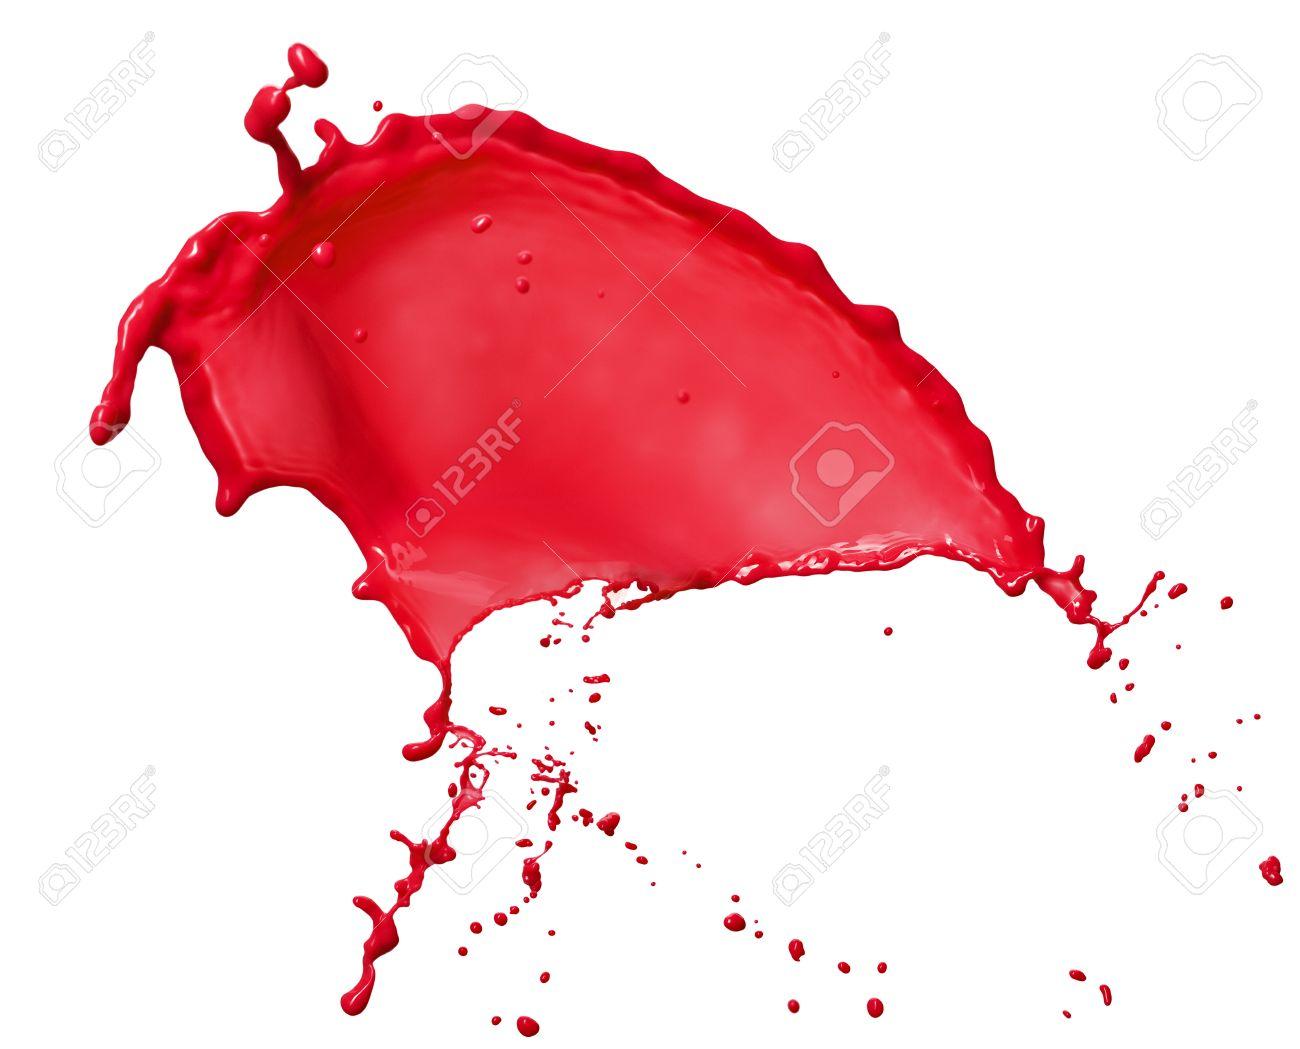 Pink liquid splash isolated on white backgraound - 25950826